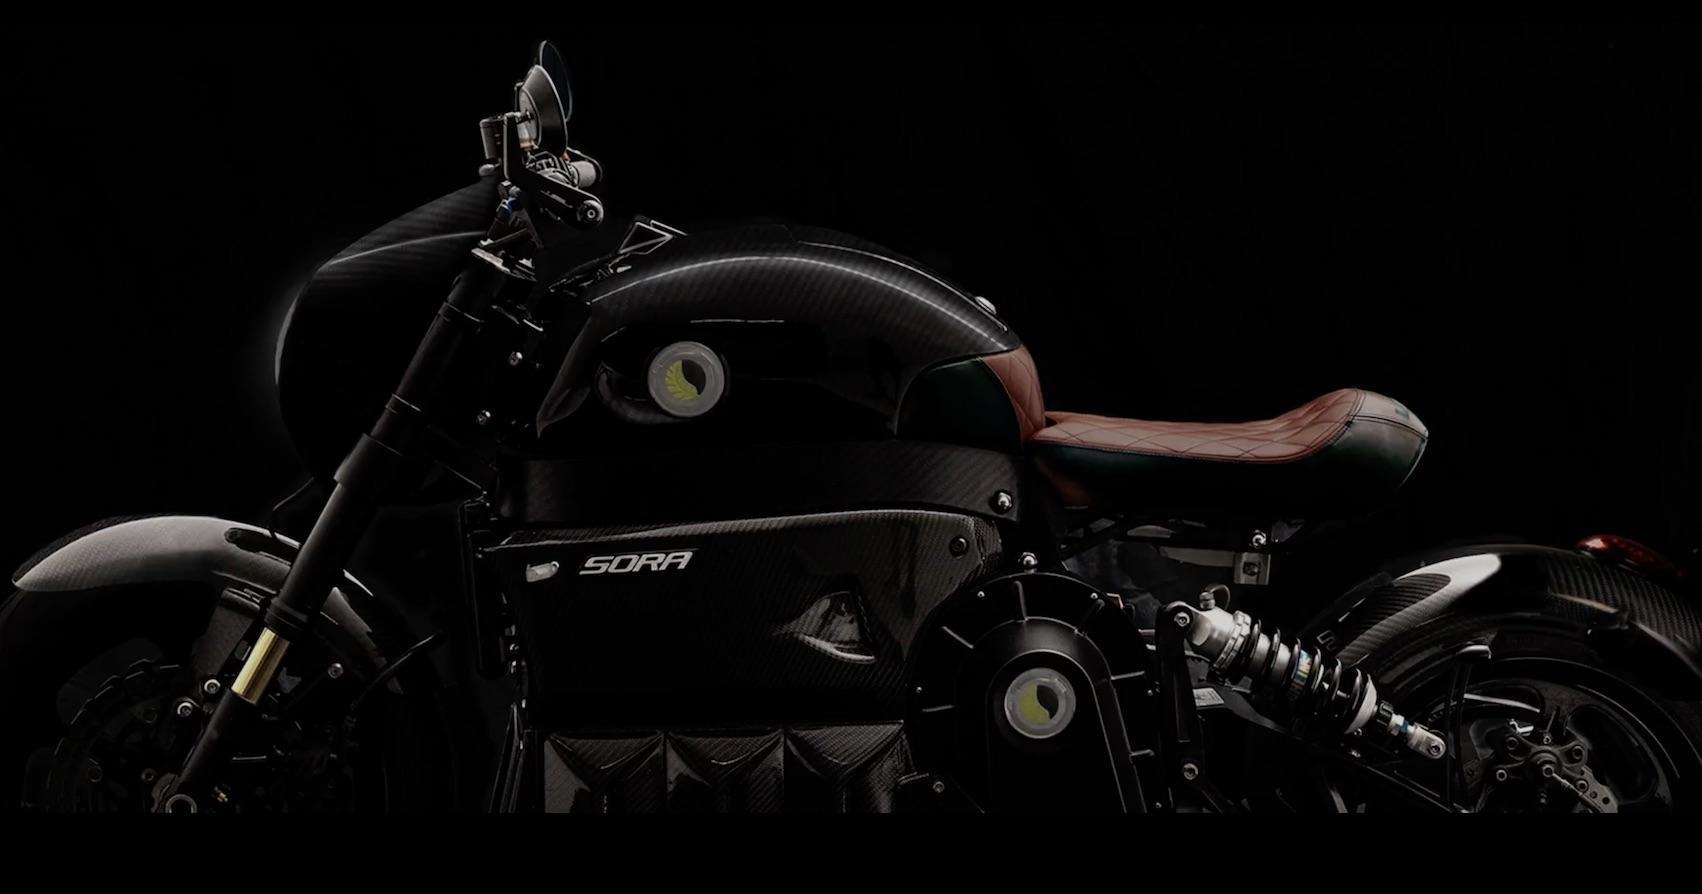 Sora Motorcycles